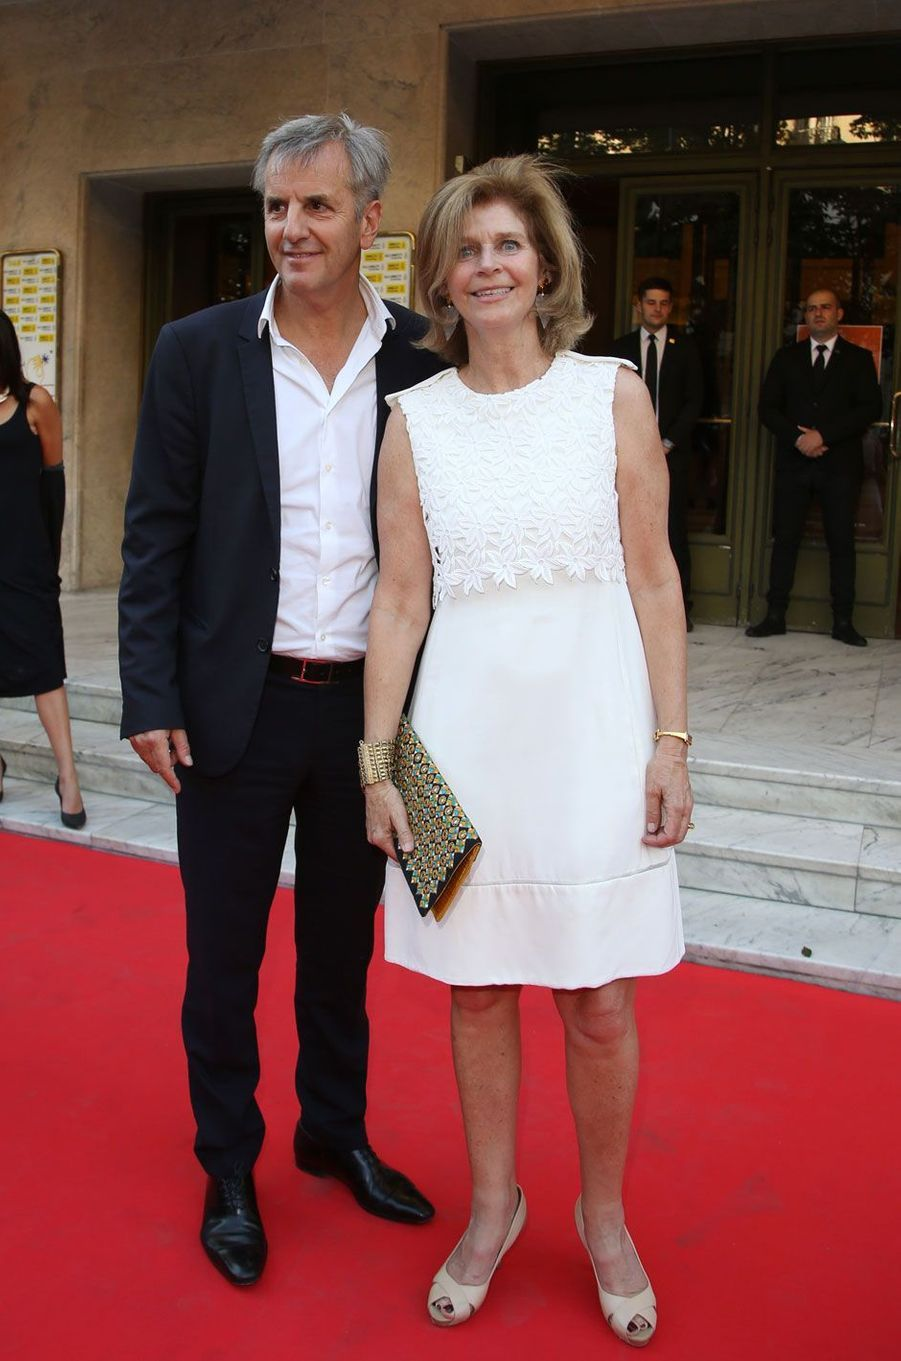 Bernard de la Villardière et sa femme